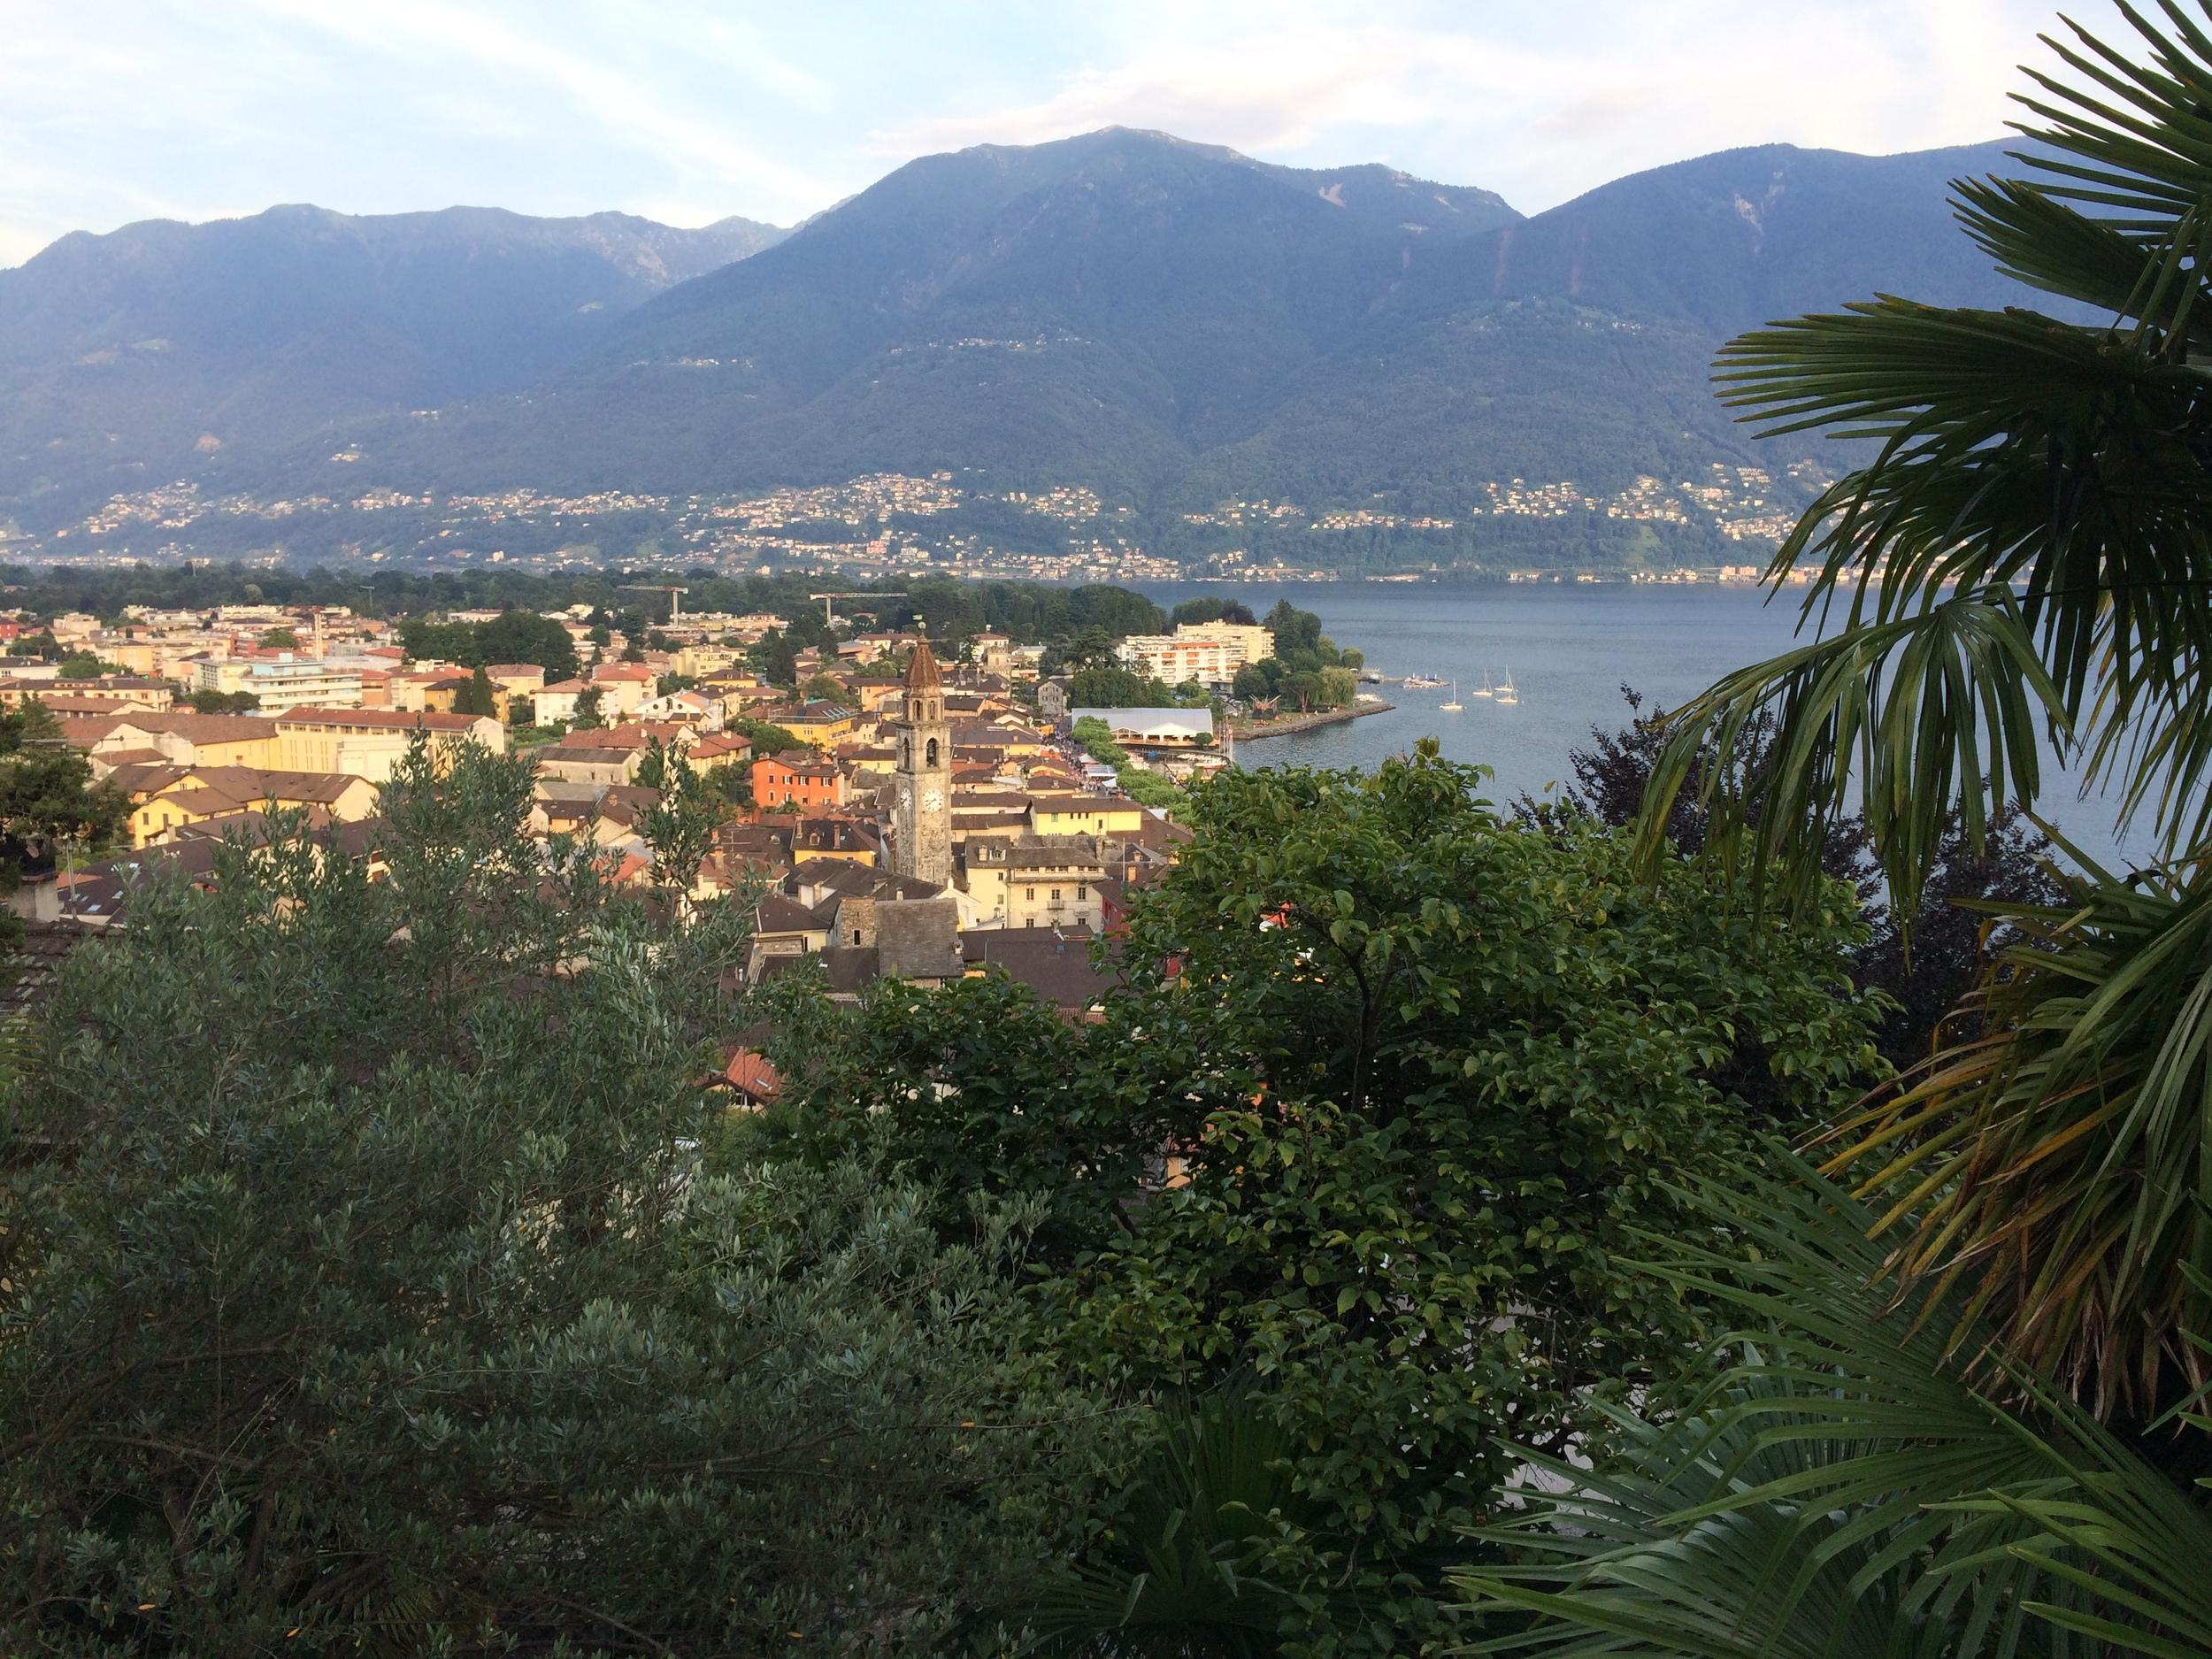 Ascona, Switzerland